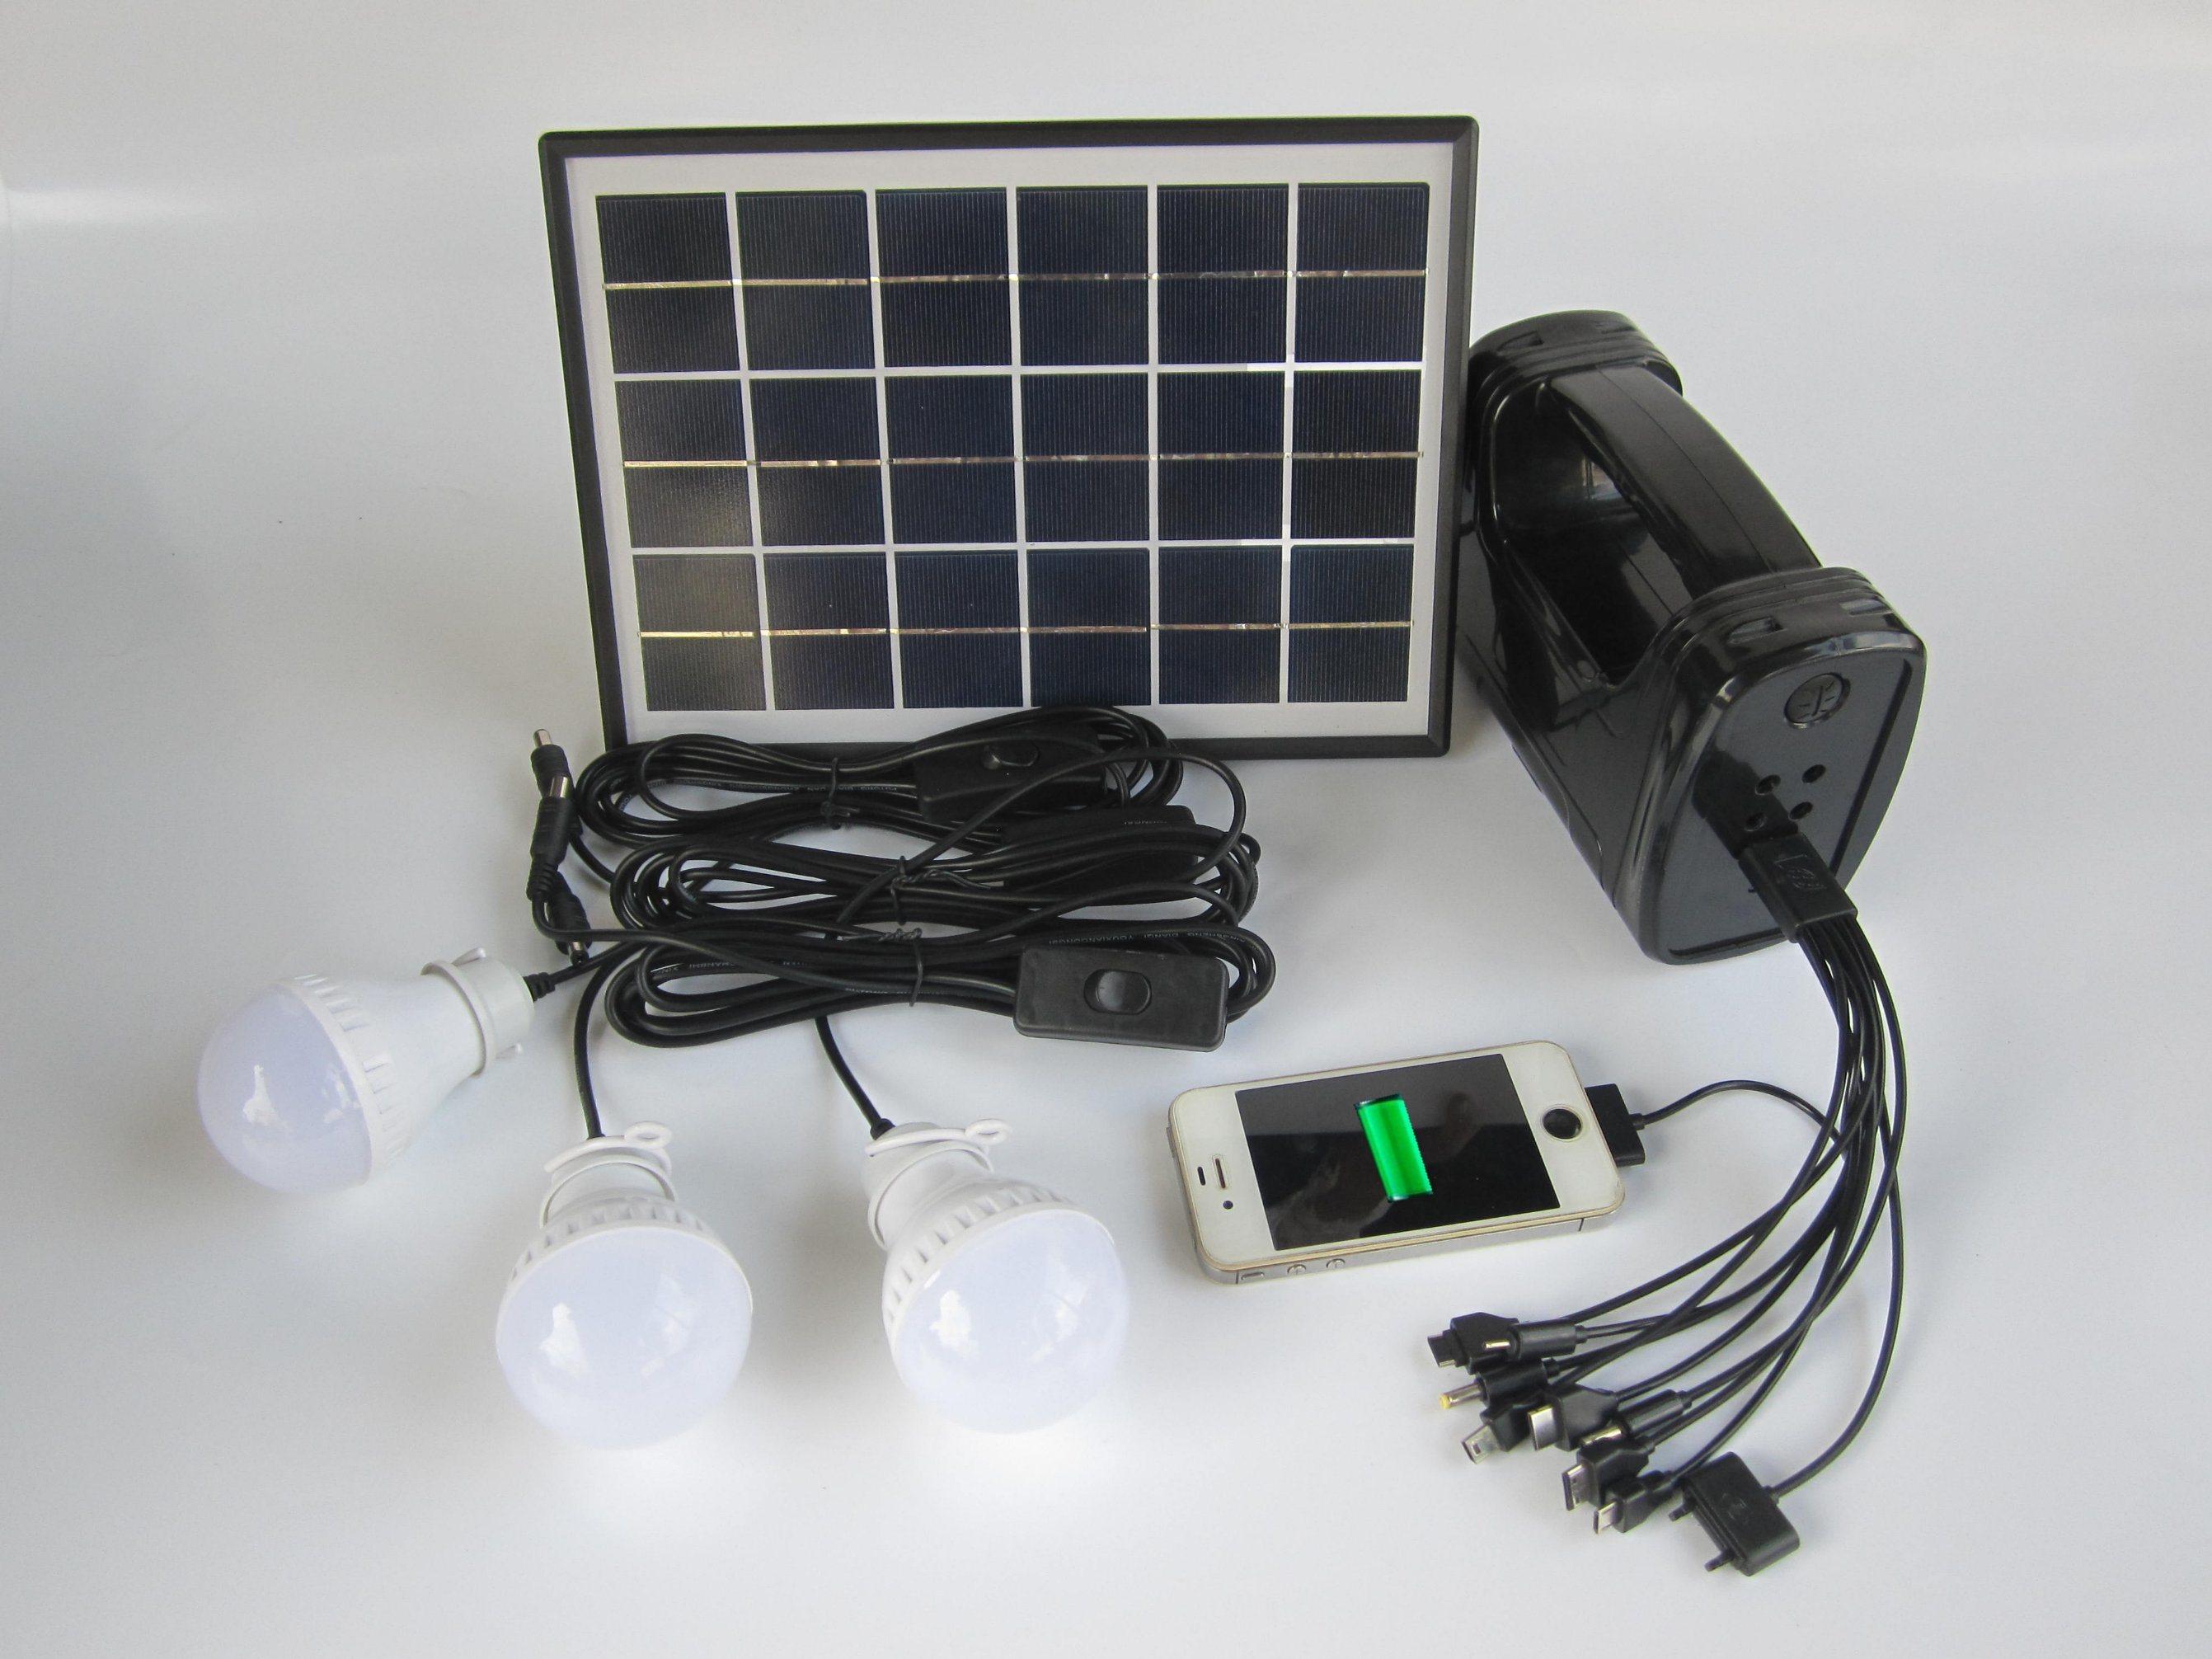 Hot Item Solar Lamp With Light Kit Reading Kits 5w Panel Fm Radio